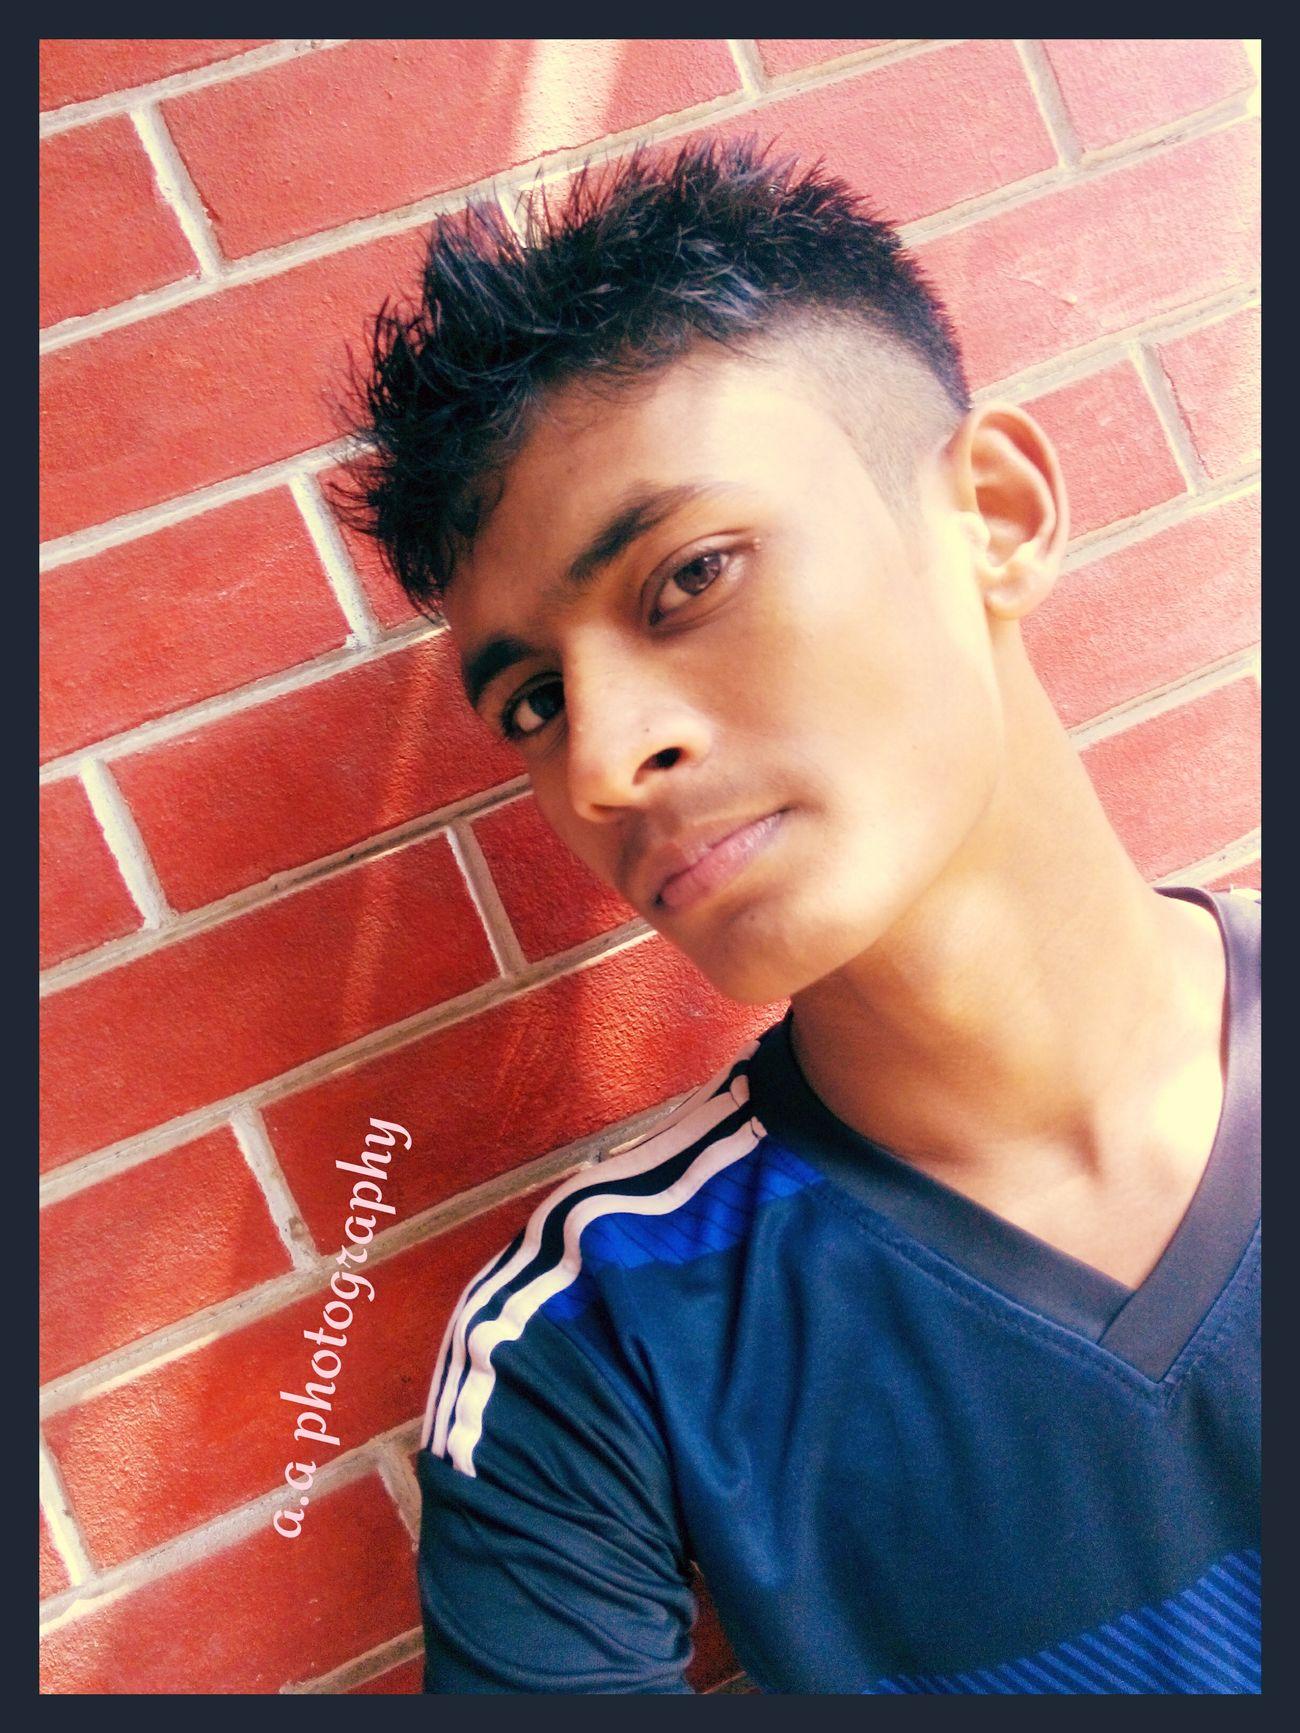 Dhunat mor, Sherpur, Bogra,BangladeshThe Places I've Been Today